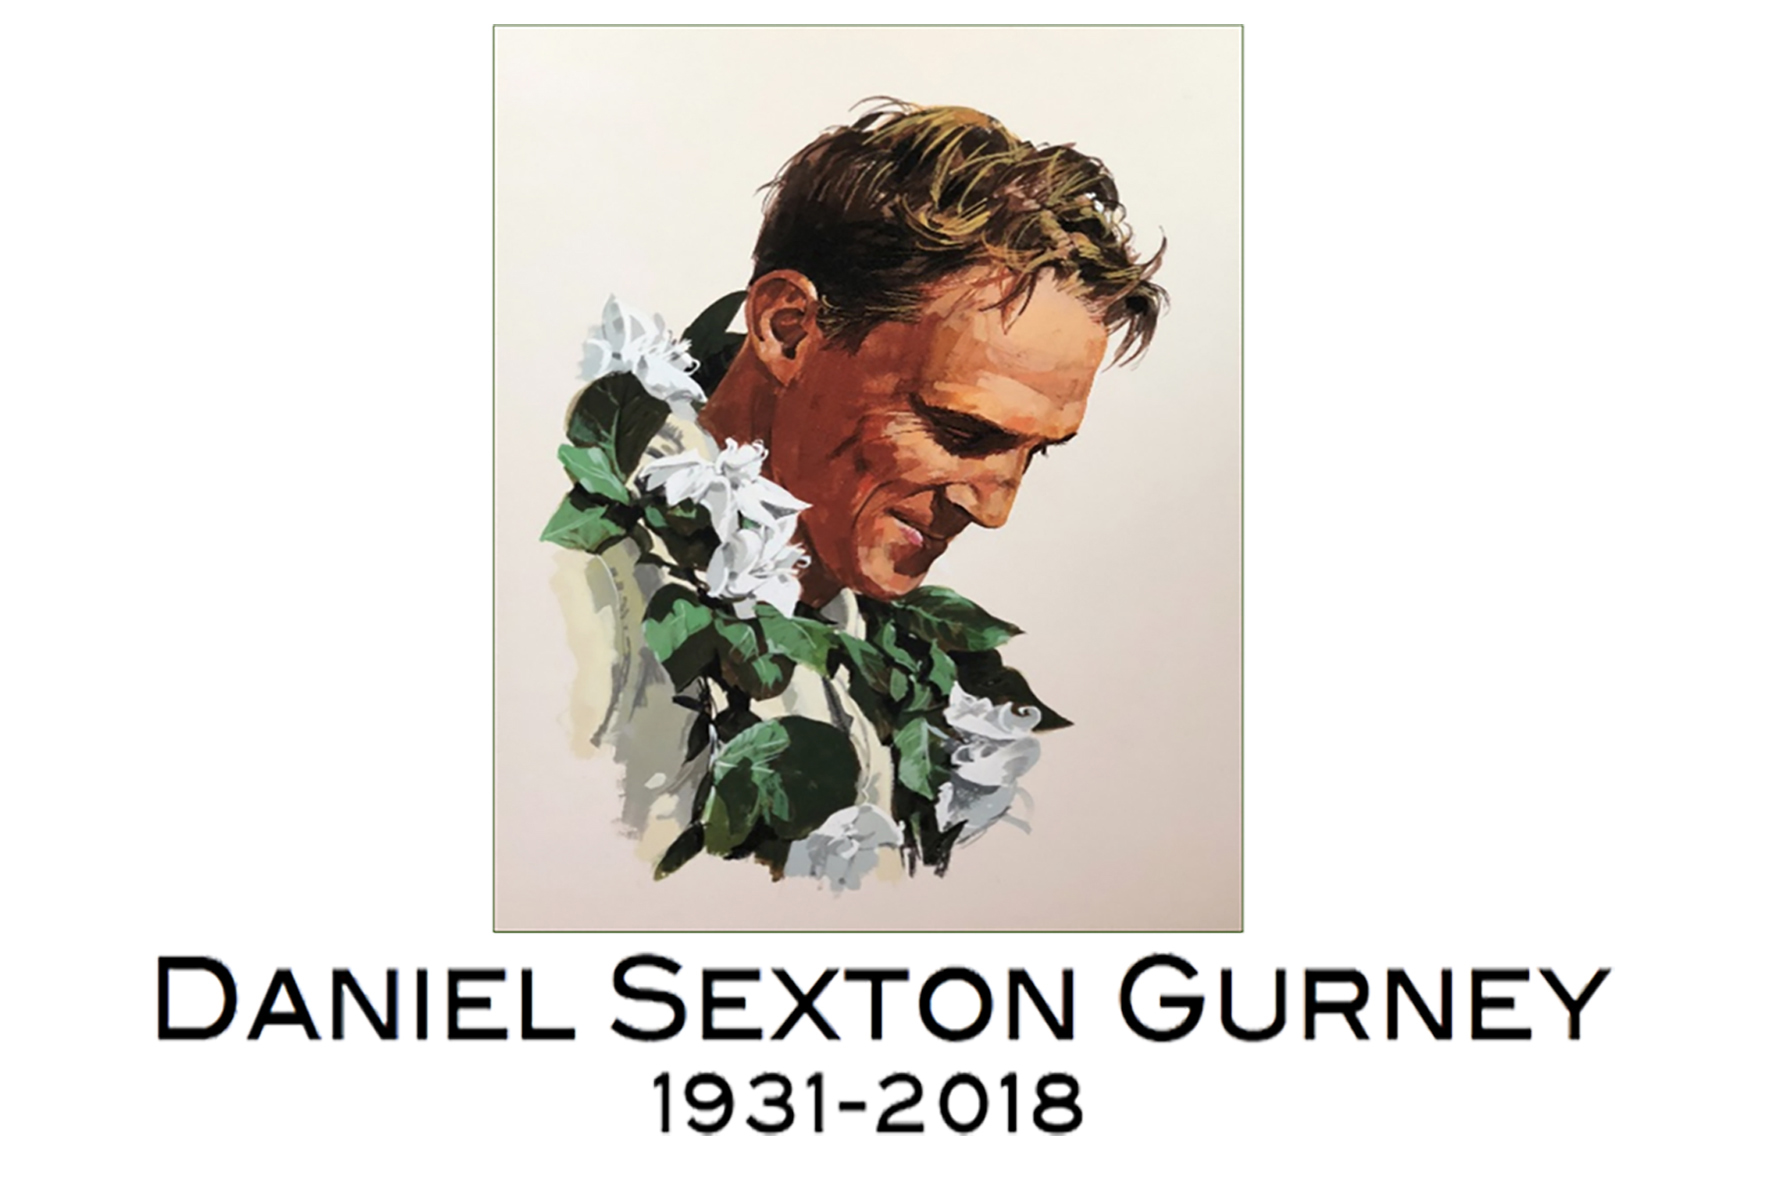 R Dangurney Revised Memorial Image